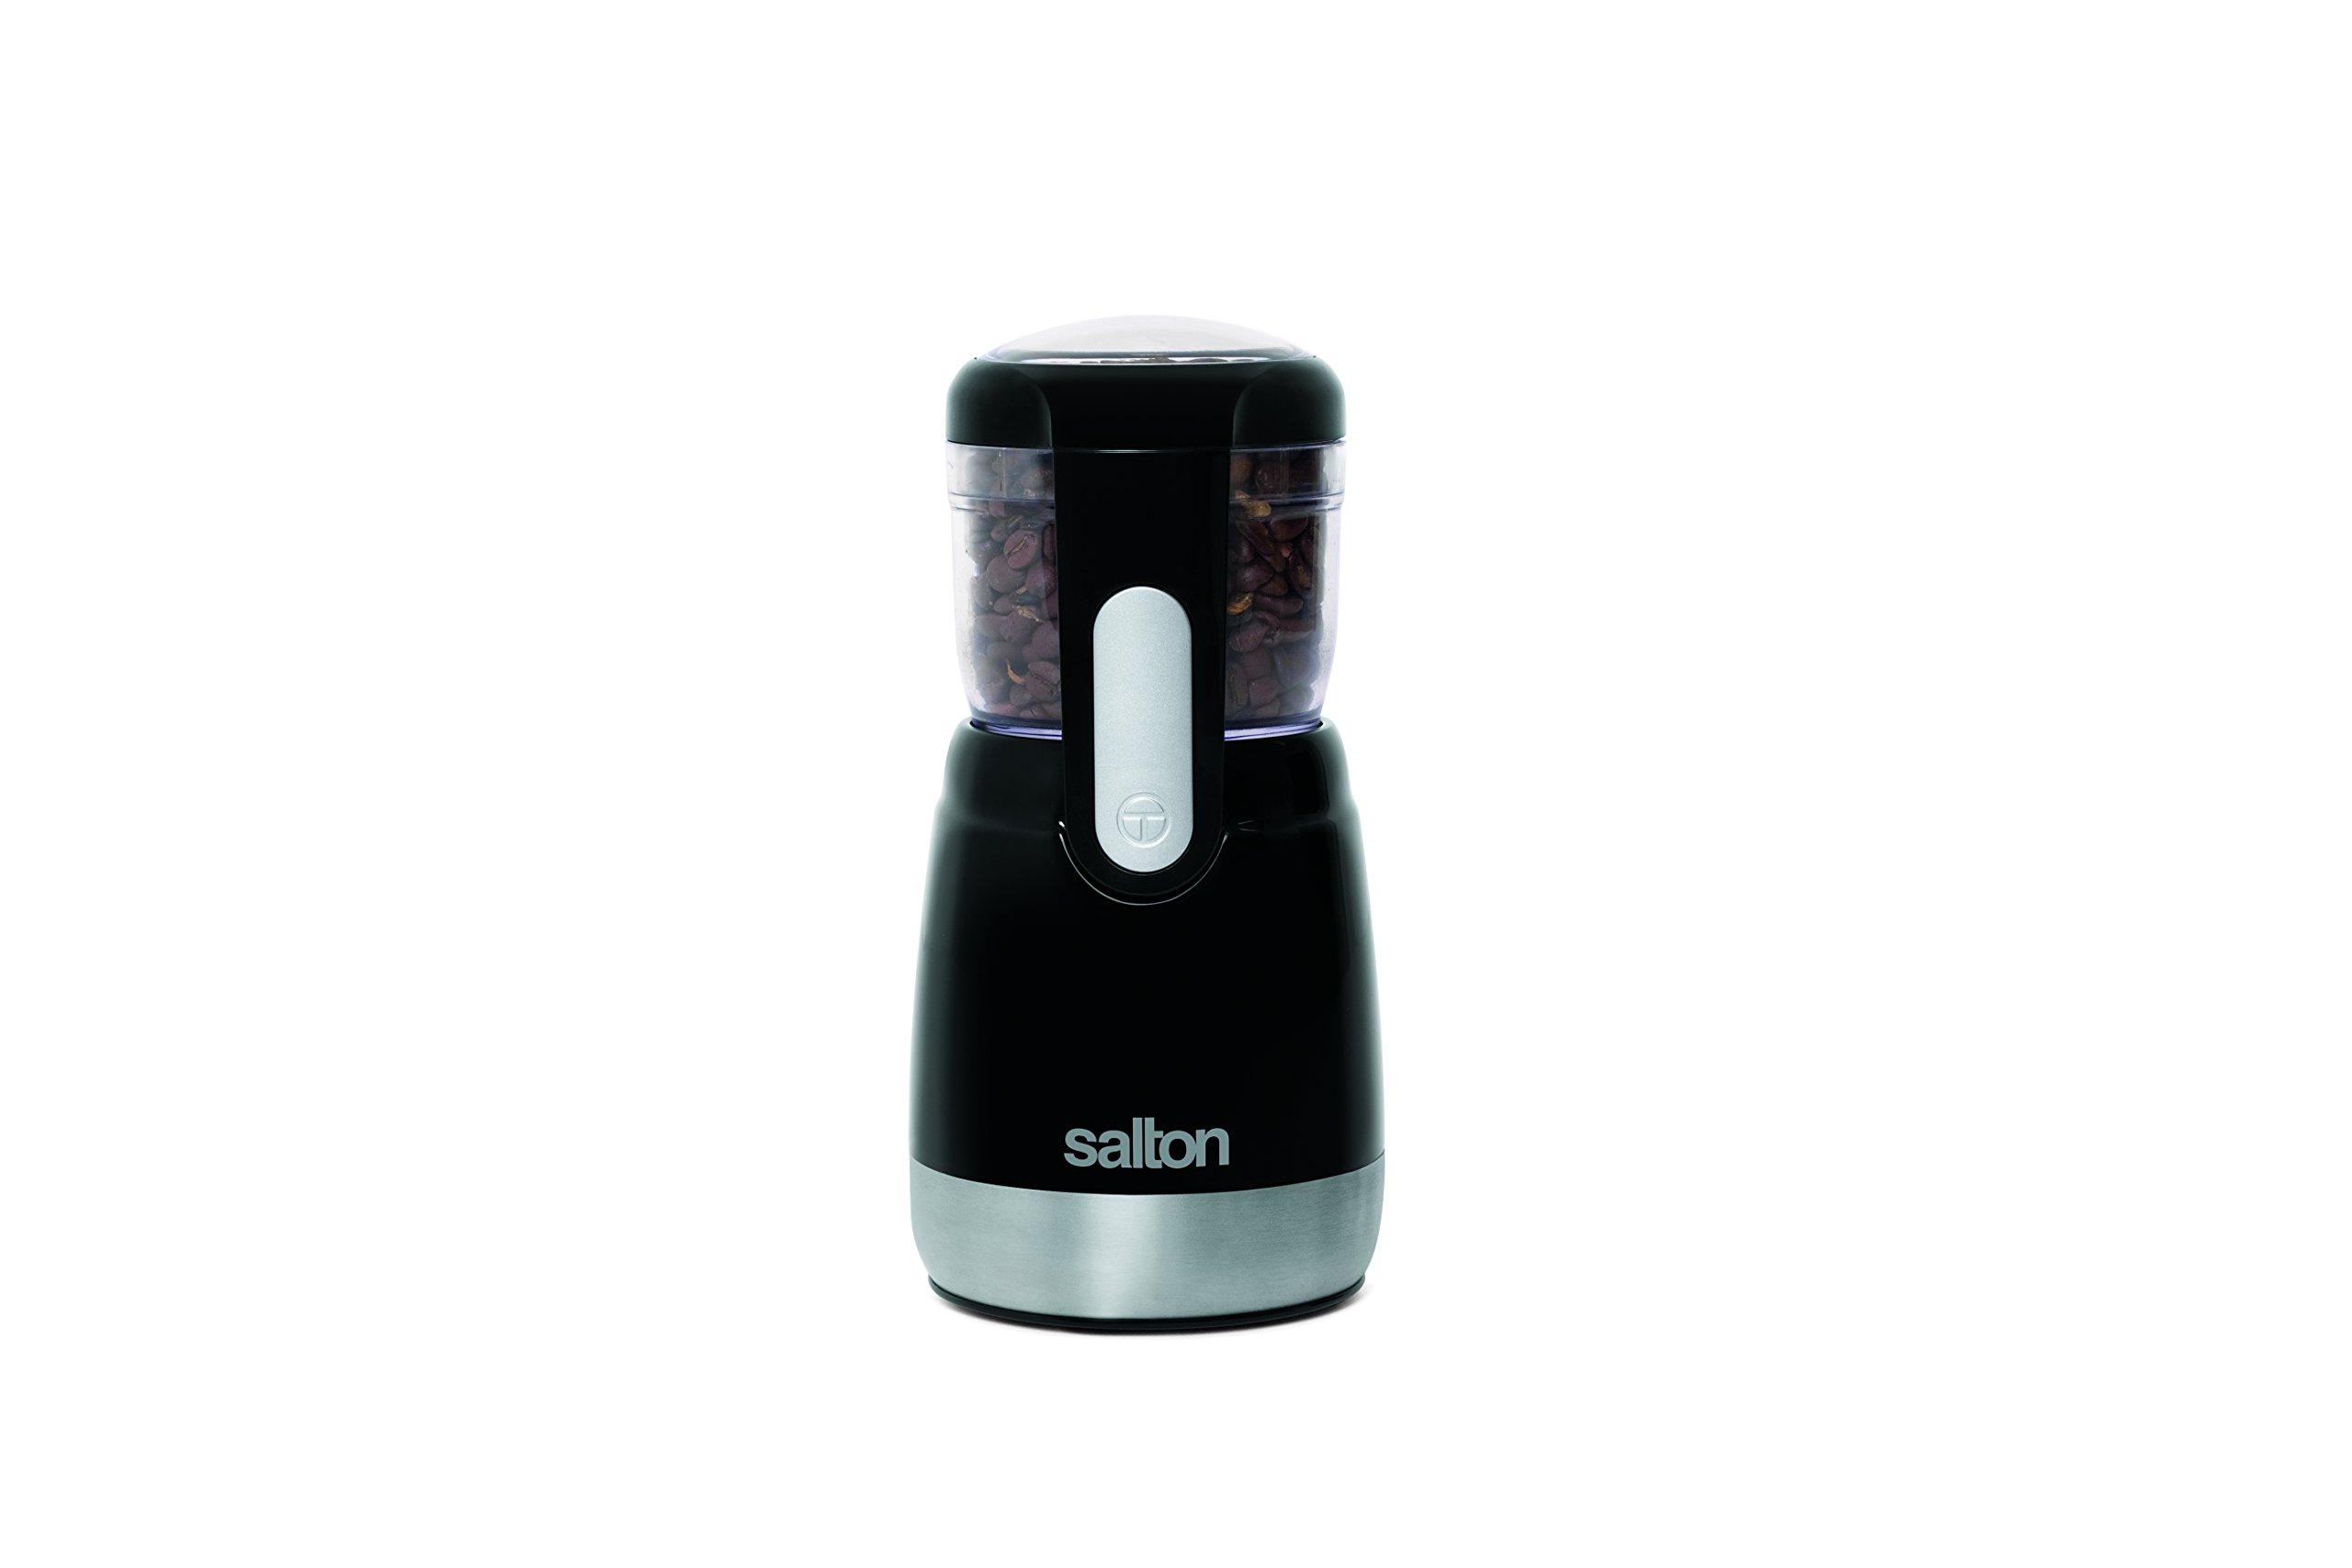 Black Salton CG7B Coffee and Spice Grinder